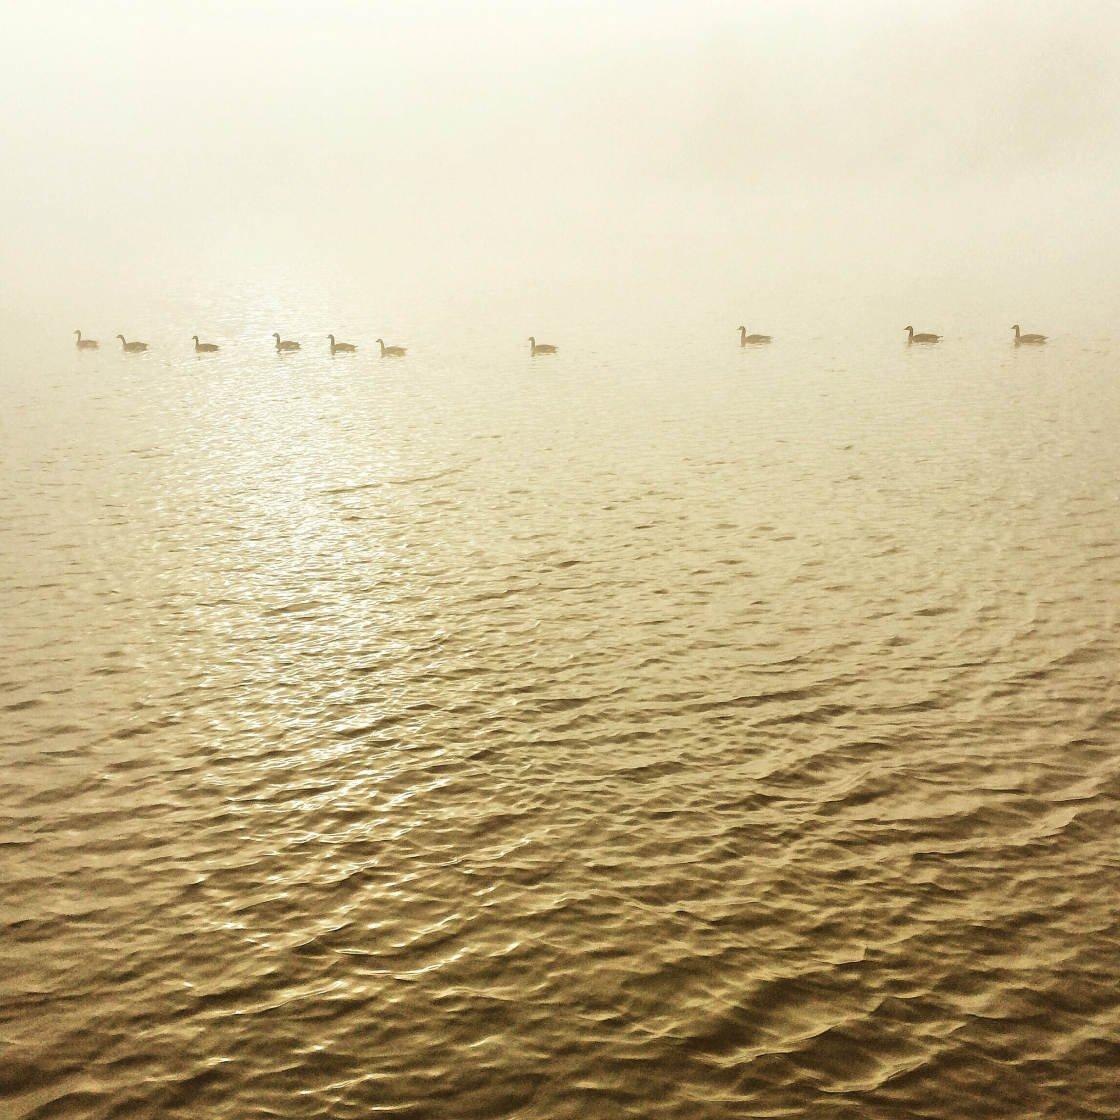 moody landscape photography no script